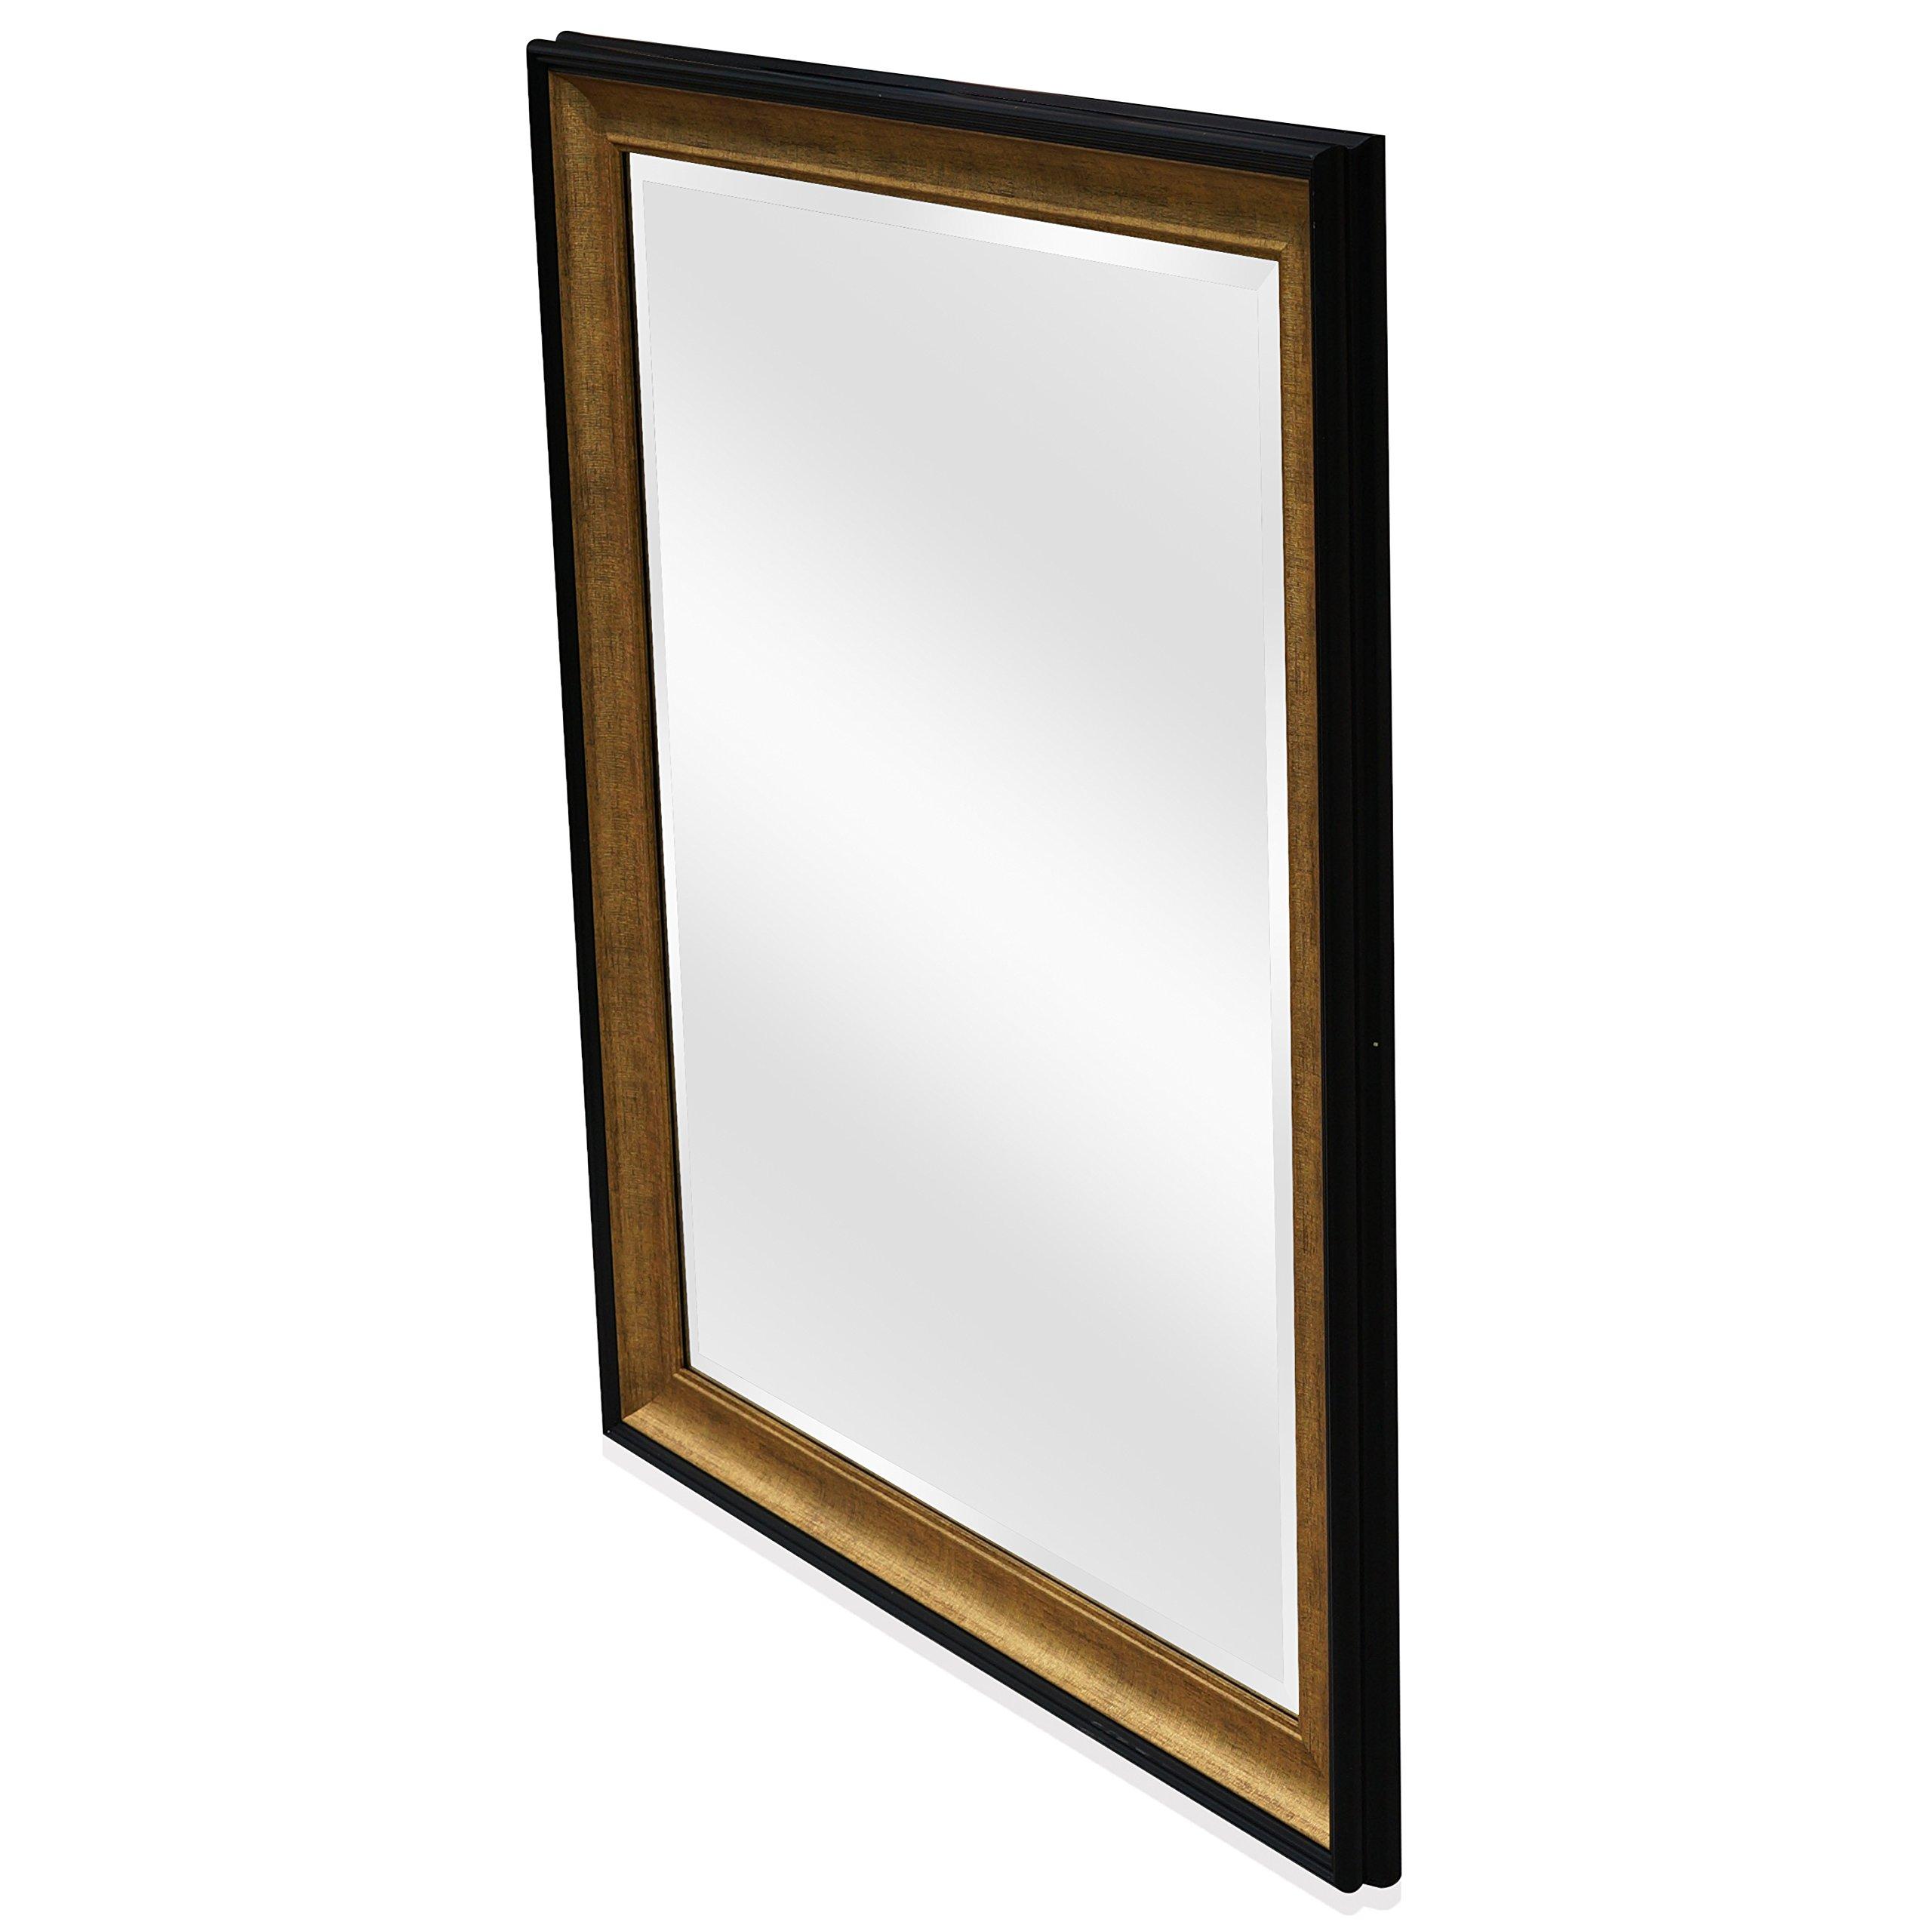 Wall Beveled Mirror Framed - Bedroom or Bathroom ...